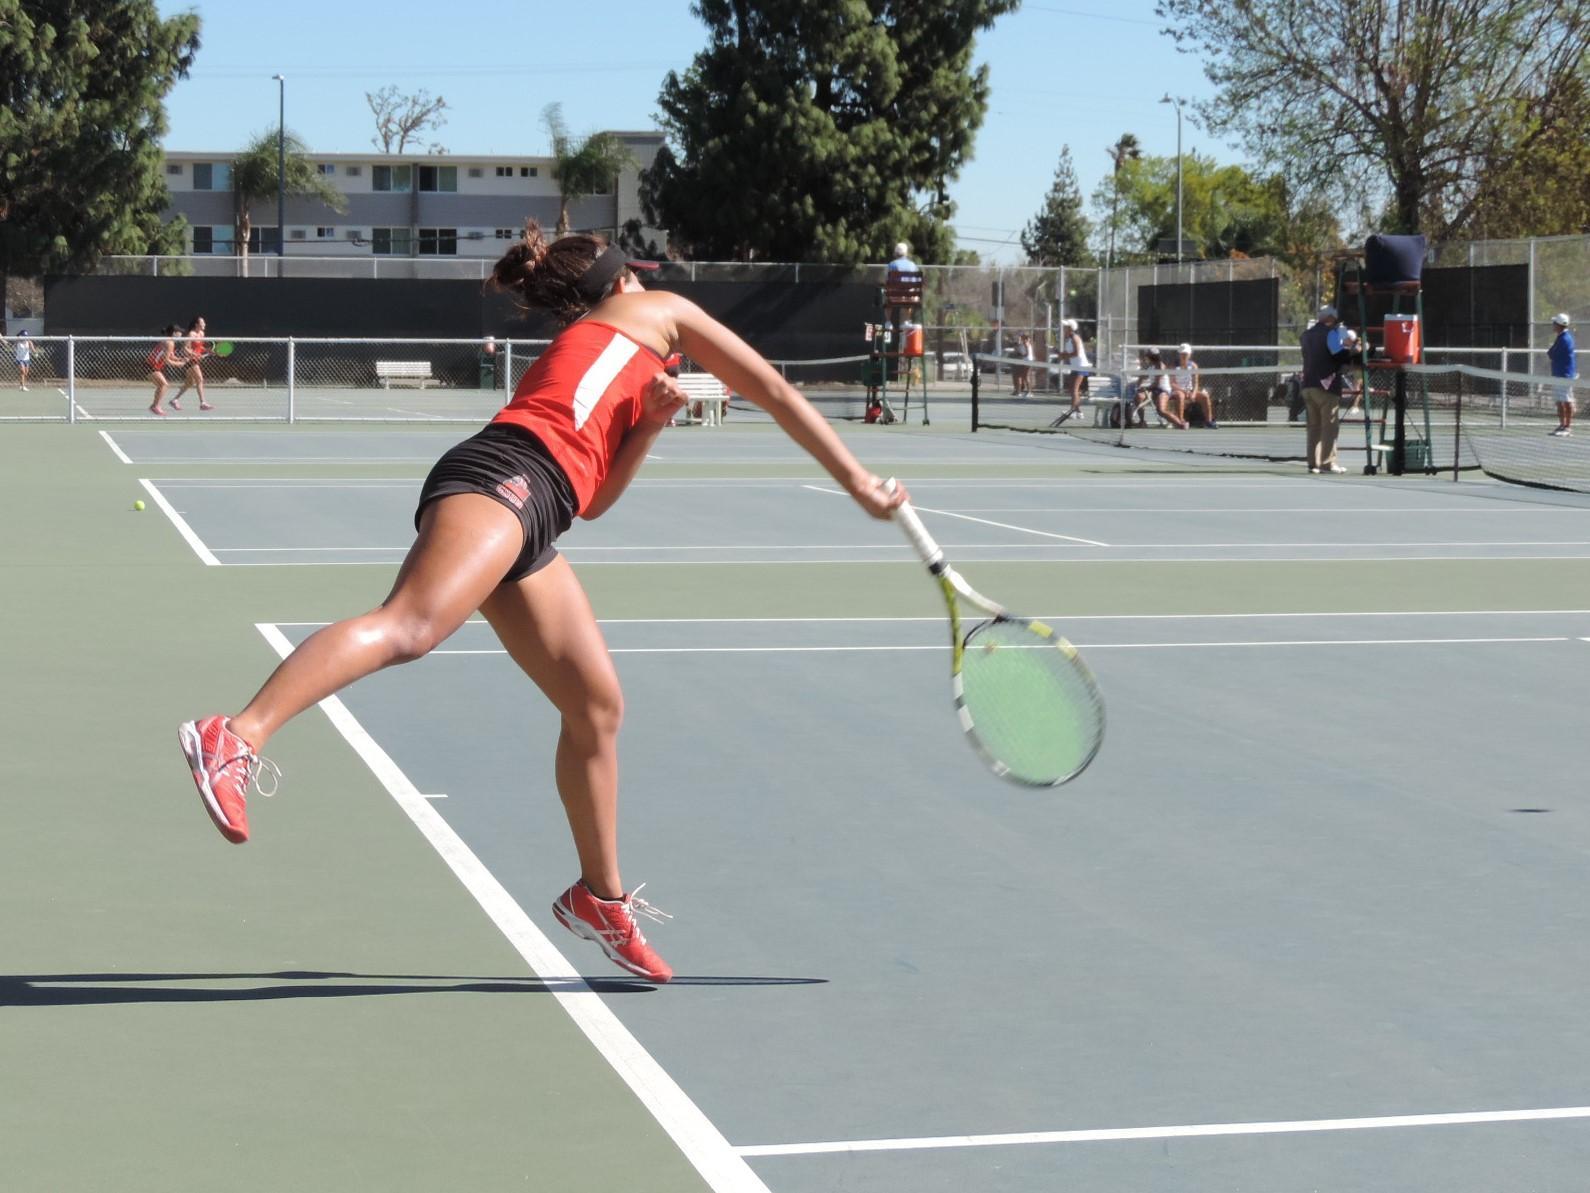 Junior Kristen Poei in full swing during her match against UC Riverside. Photo credit: Amanda Reveles